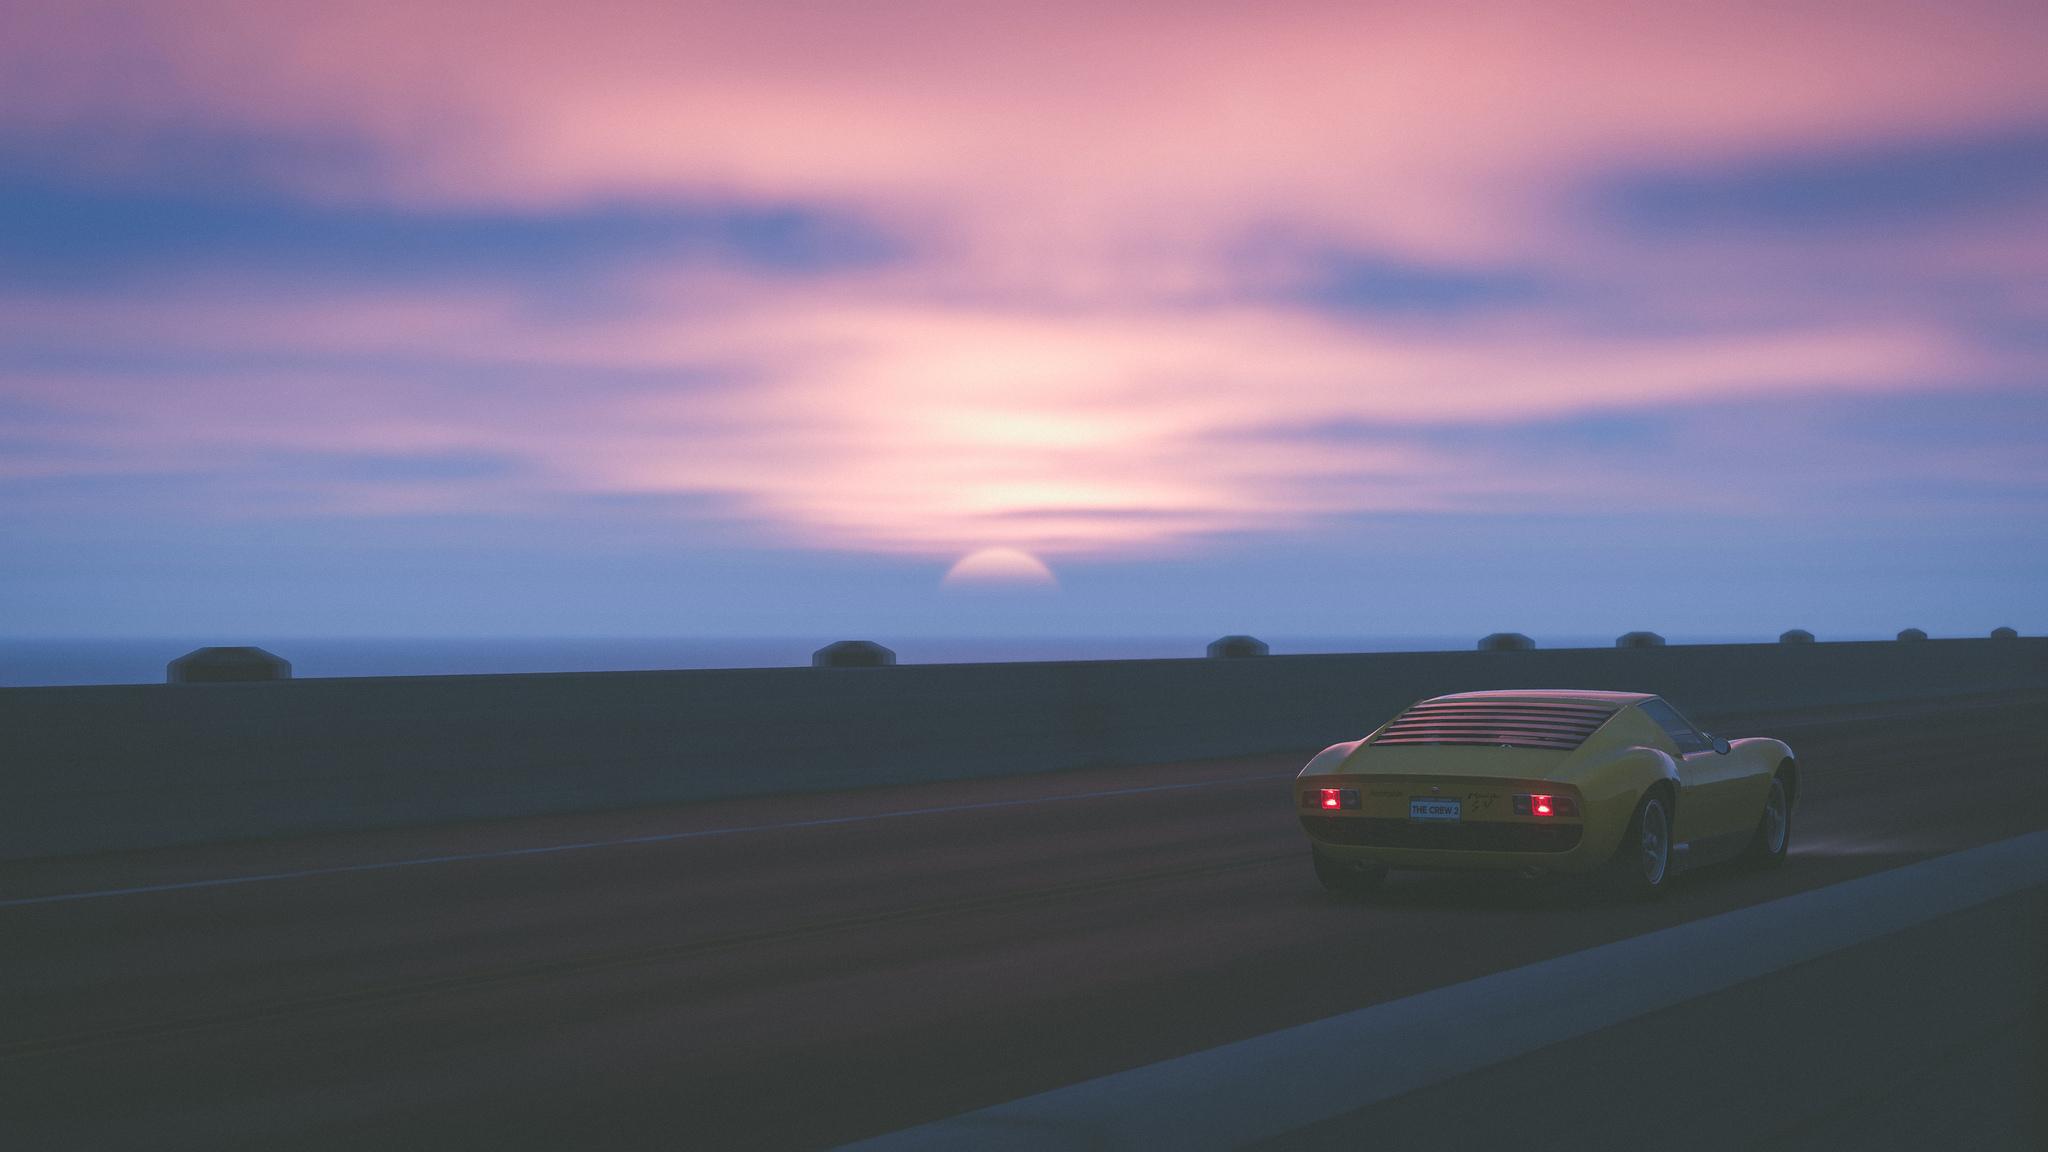 2048x1152 The Crew 2 Lamborghini Miura SV 4k 2048x1152 Resolution HD